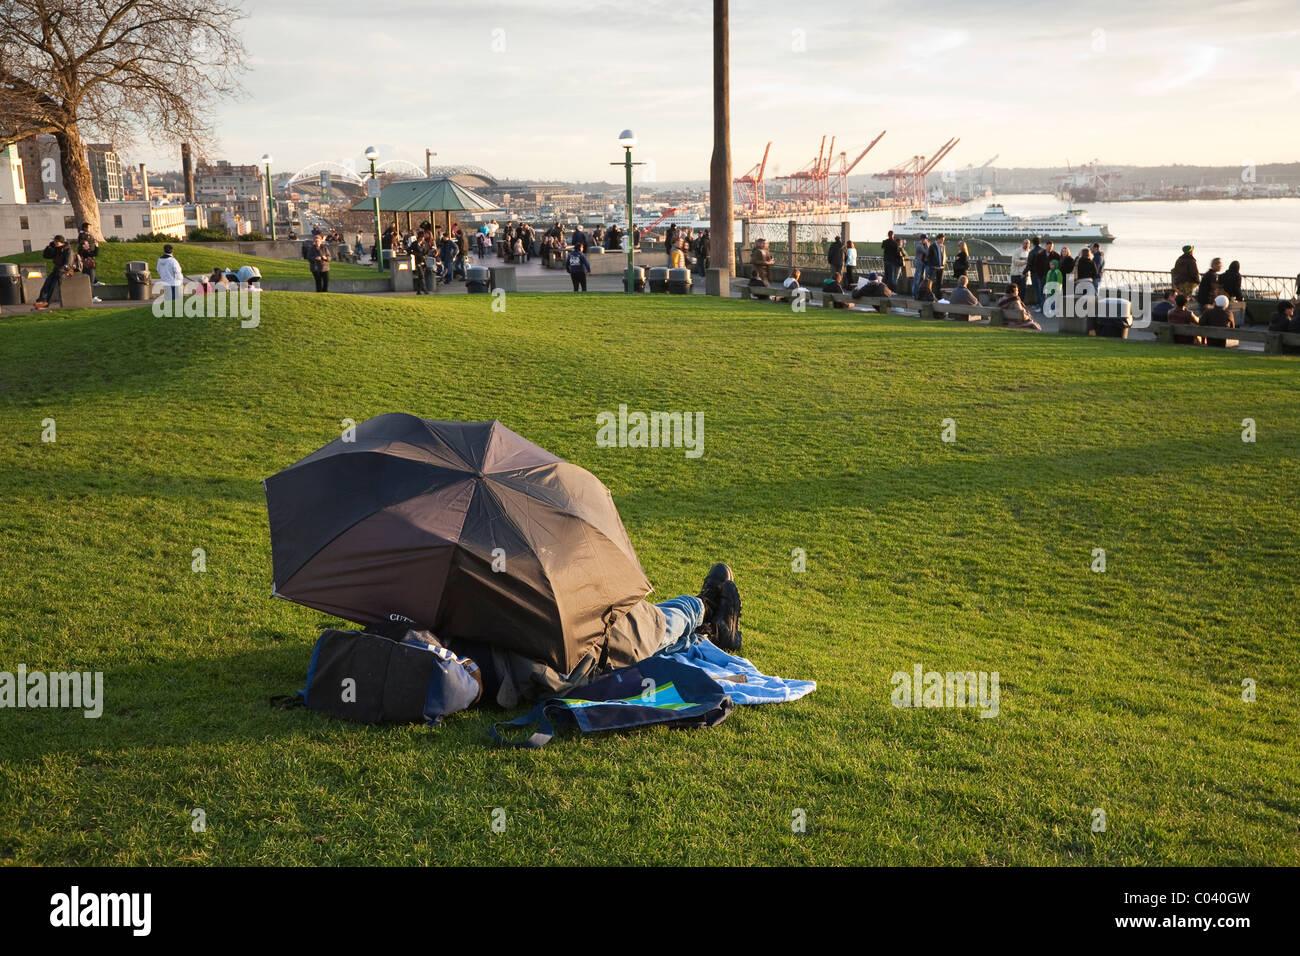 Man sleeping under an umbrella - Seattle, Washington - Stock Image